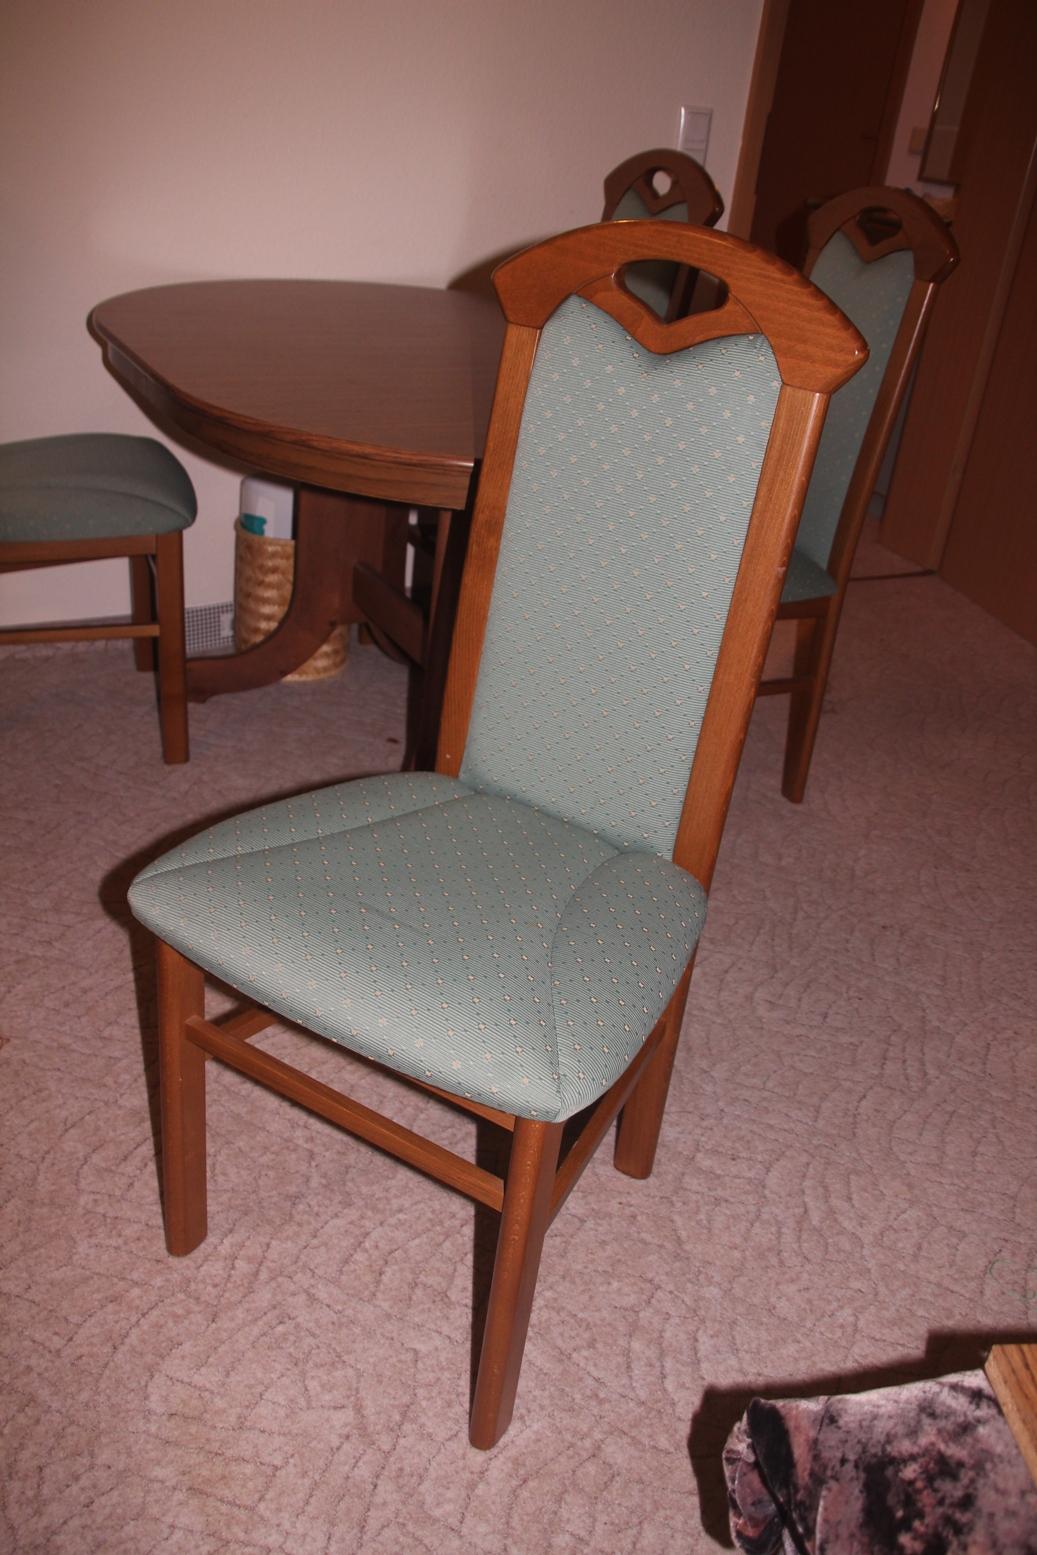 5 tlg essgruppe ausziehbarer esstisch 4 st hle mahagonifarben landhaus vintage. Black Bedroom Furniture Sets. Home Design Ideas